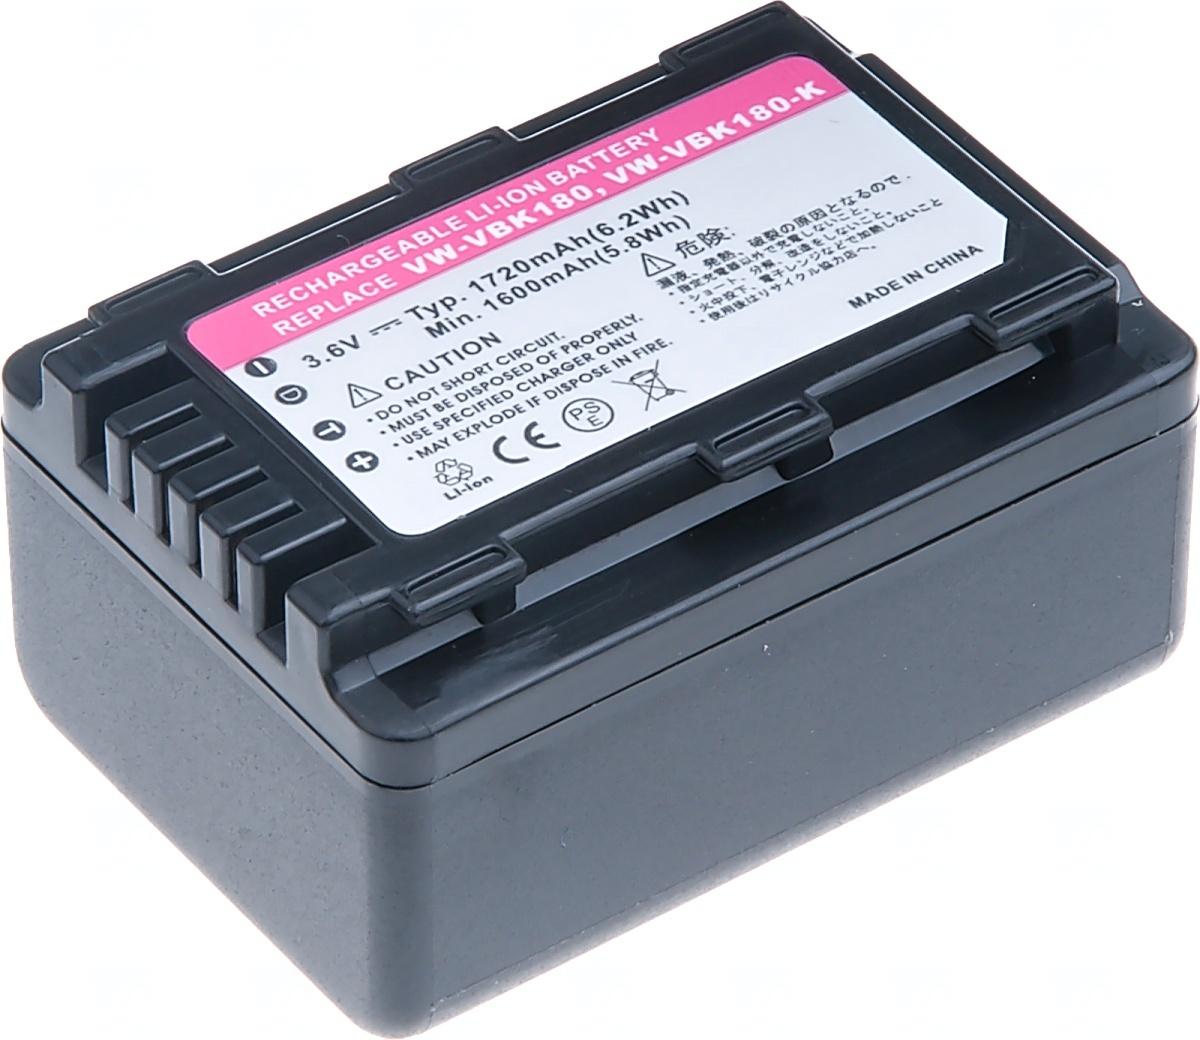 Baterie T6 power Panasonic VW-VBK180, VW-VBL090, 1720mAh, 6,2Wh, černá